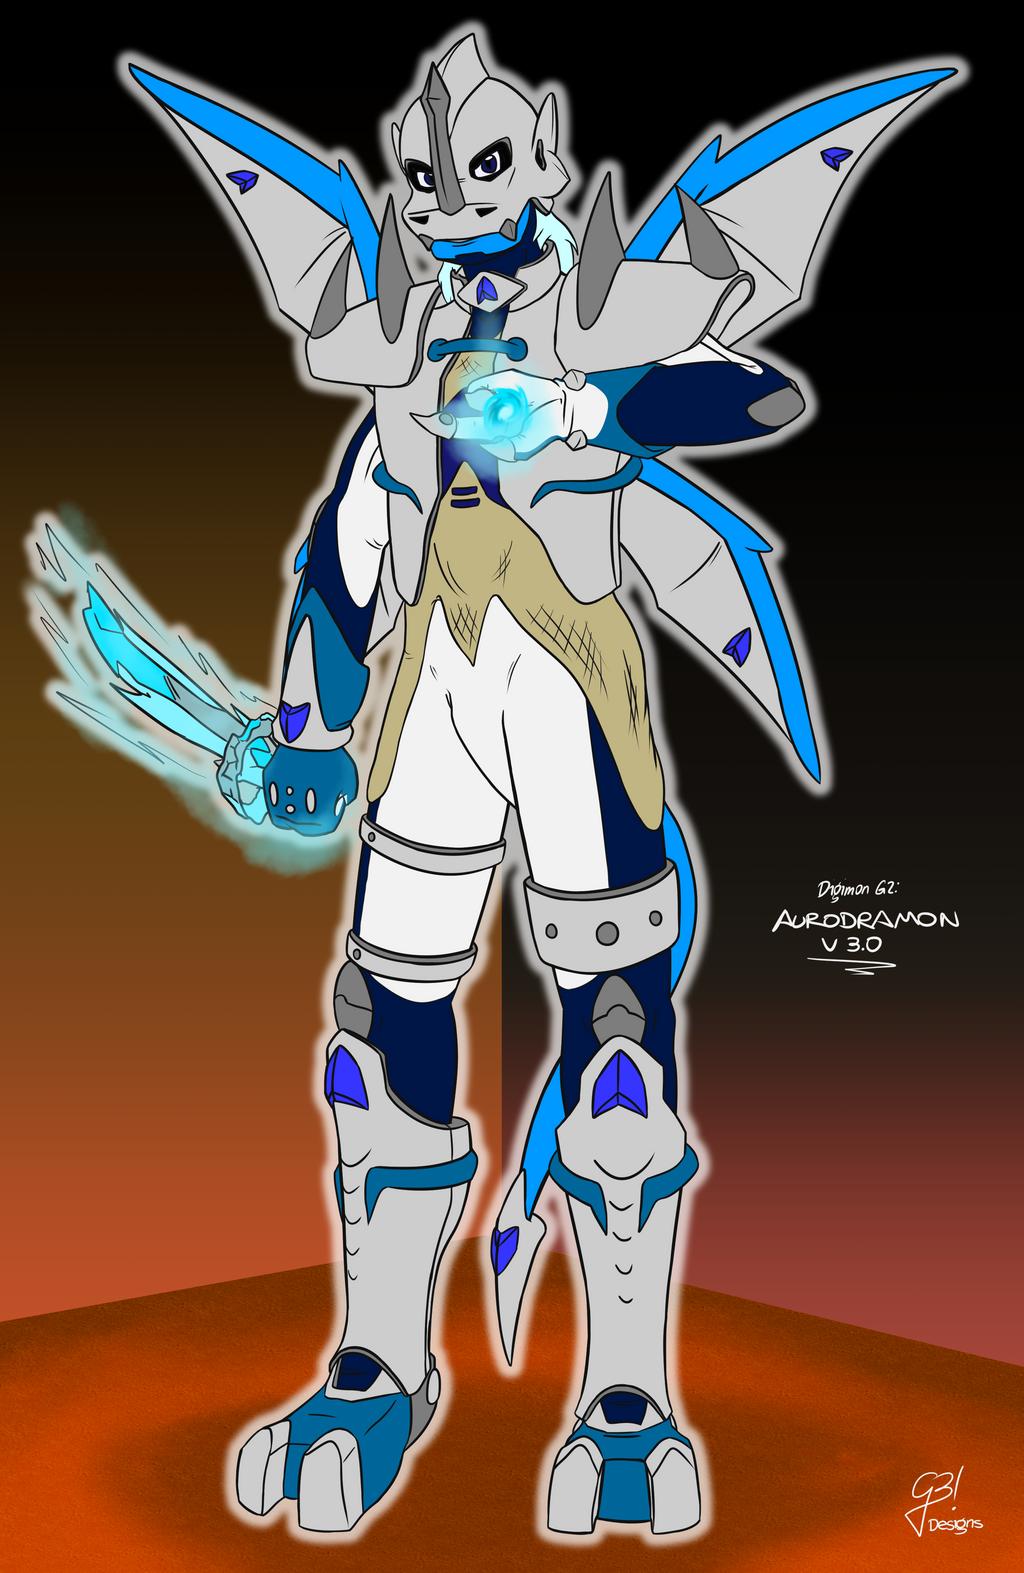 AuroDramon V3.0 | Digimon G2 charflat by G3Drakoheart-Arts